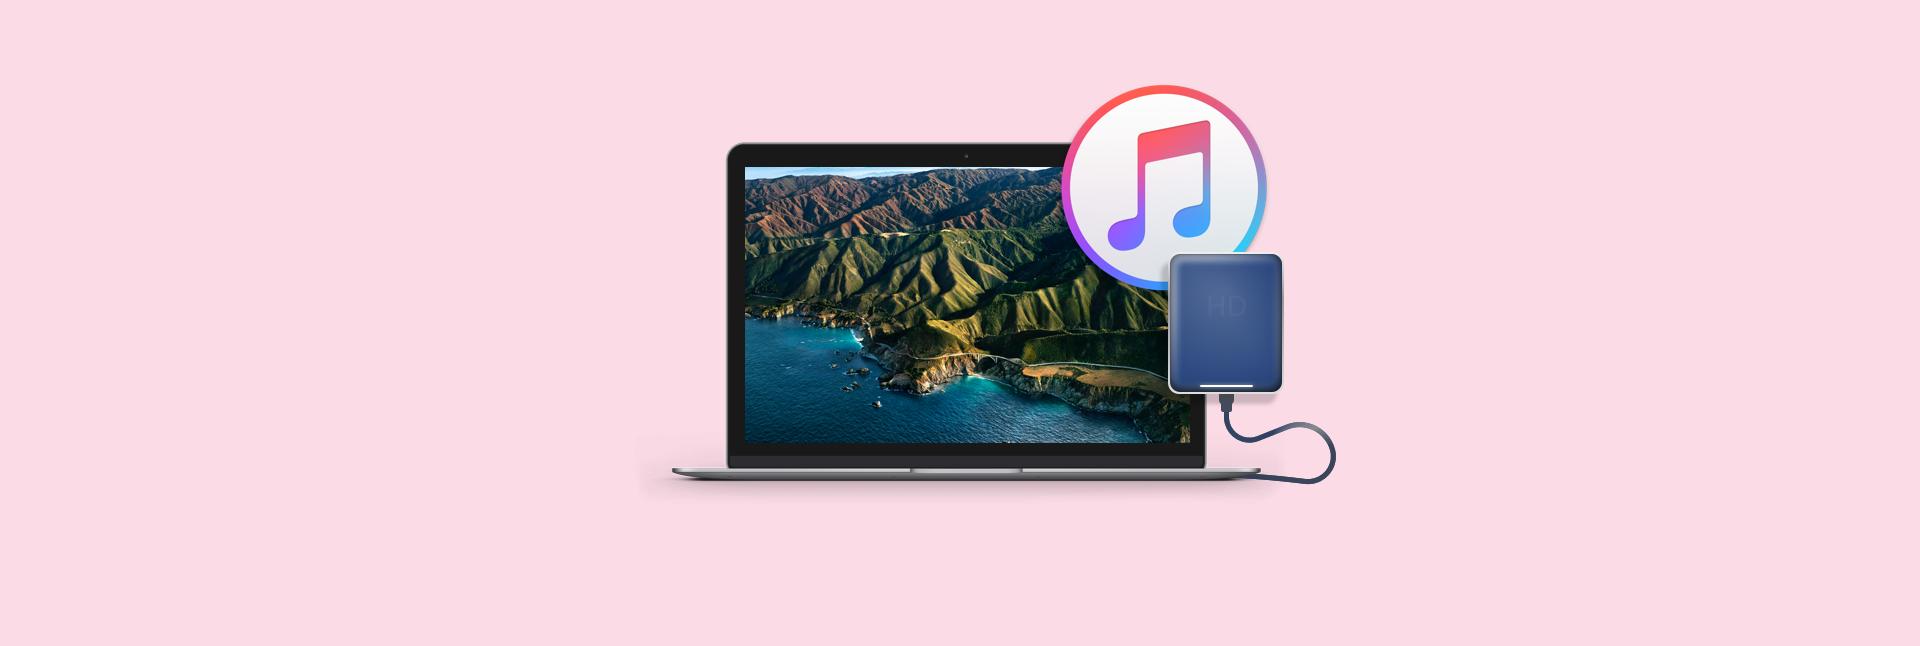 How To Backup iTunes Using An External Hard Drive – Setapp